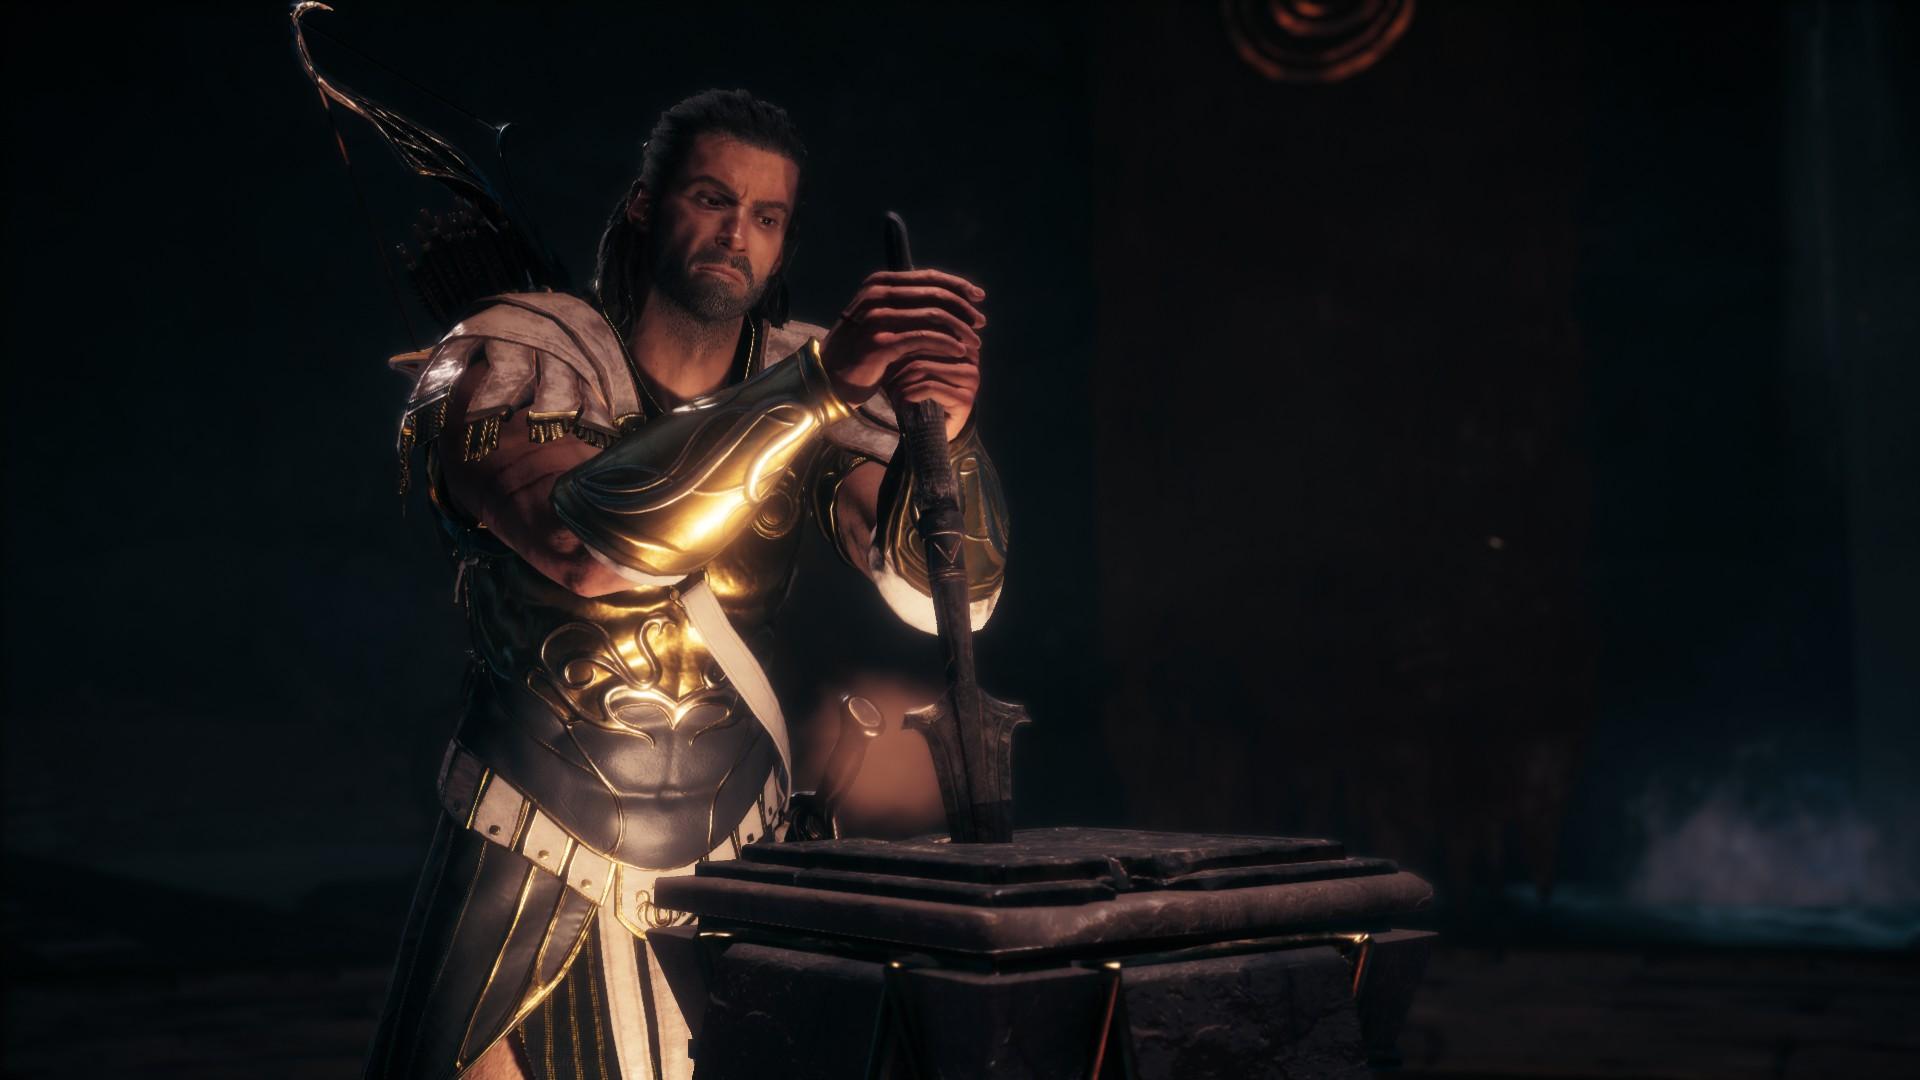 20181103104608_1.jpg - Assassin's Creed: Odyssey